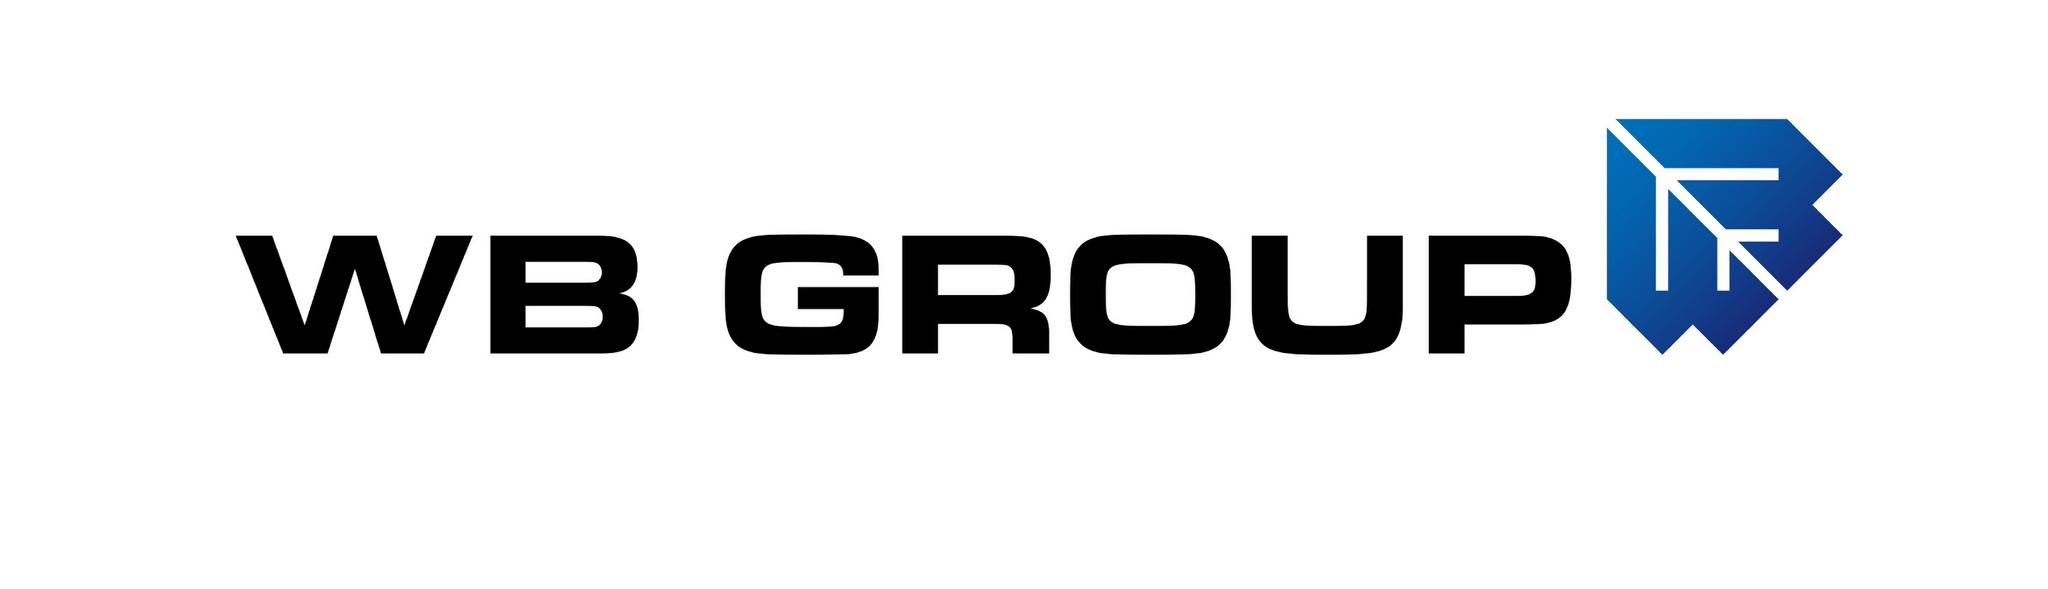 WB Group